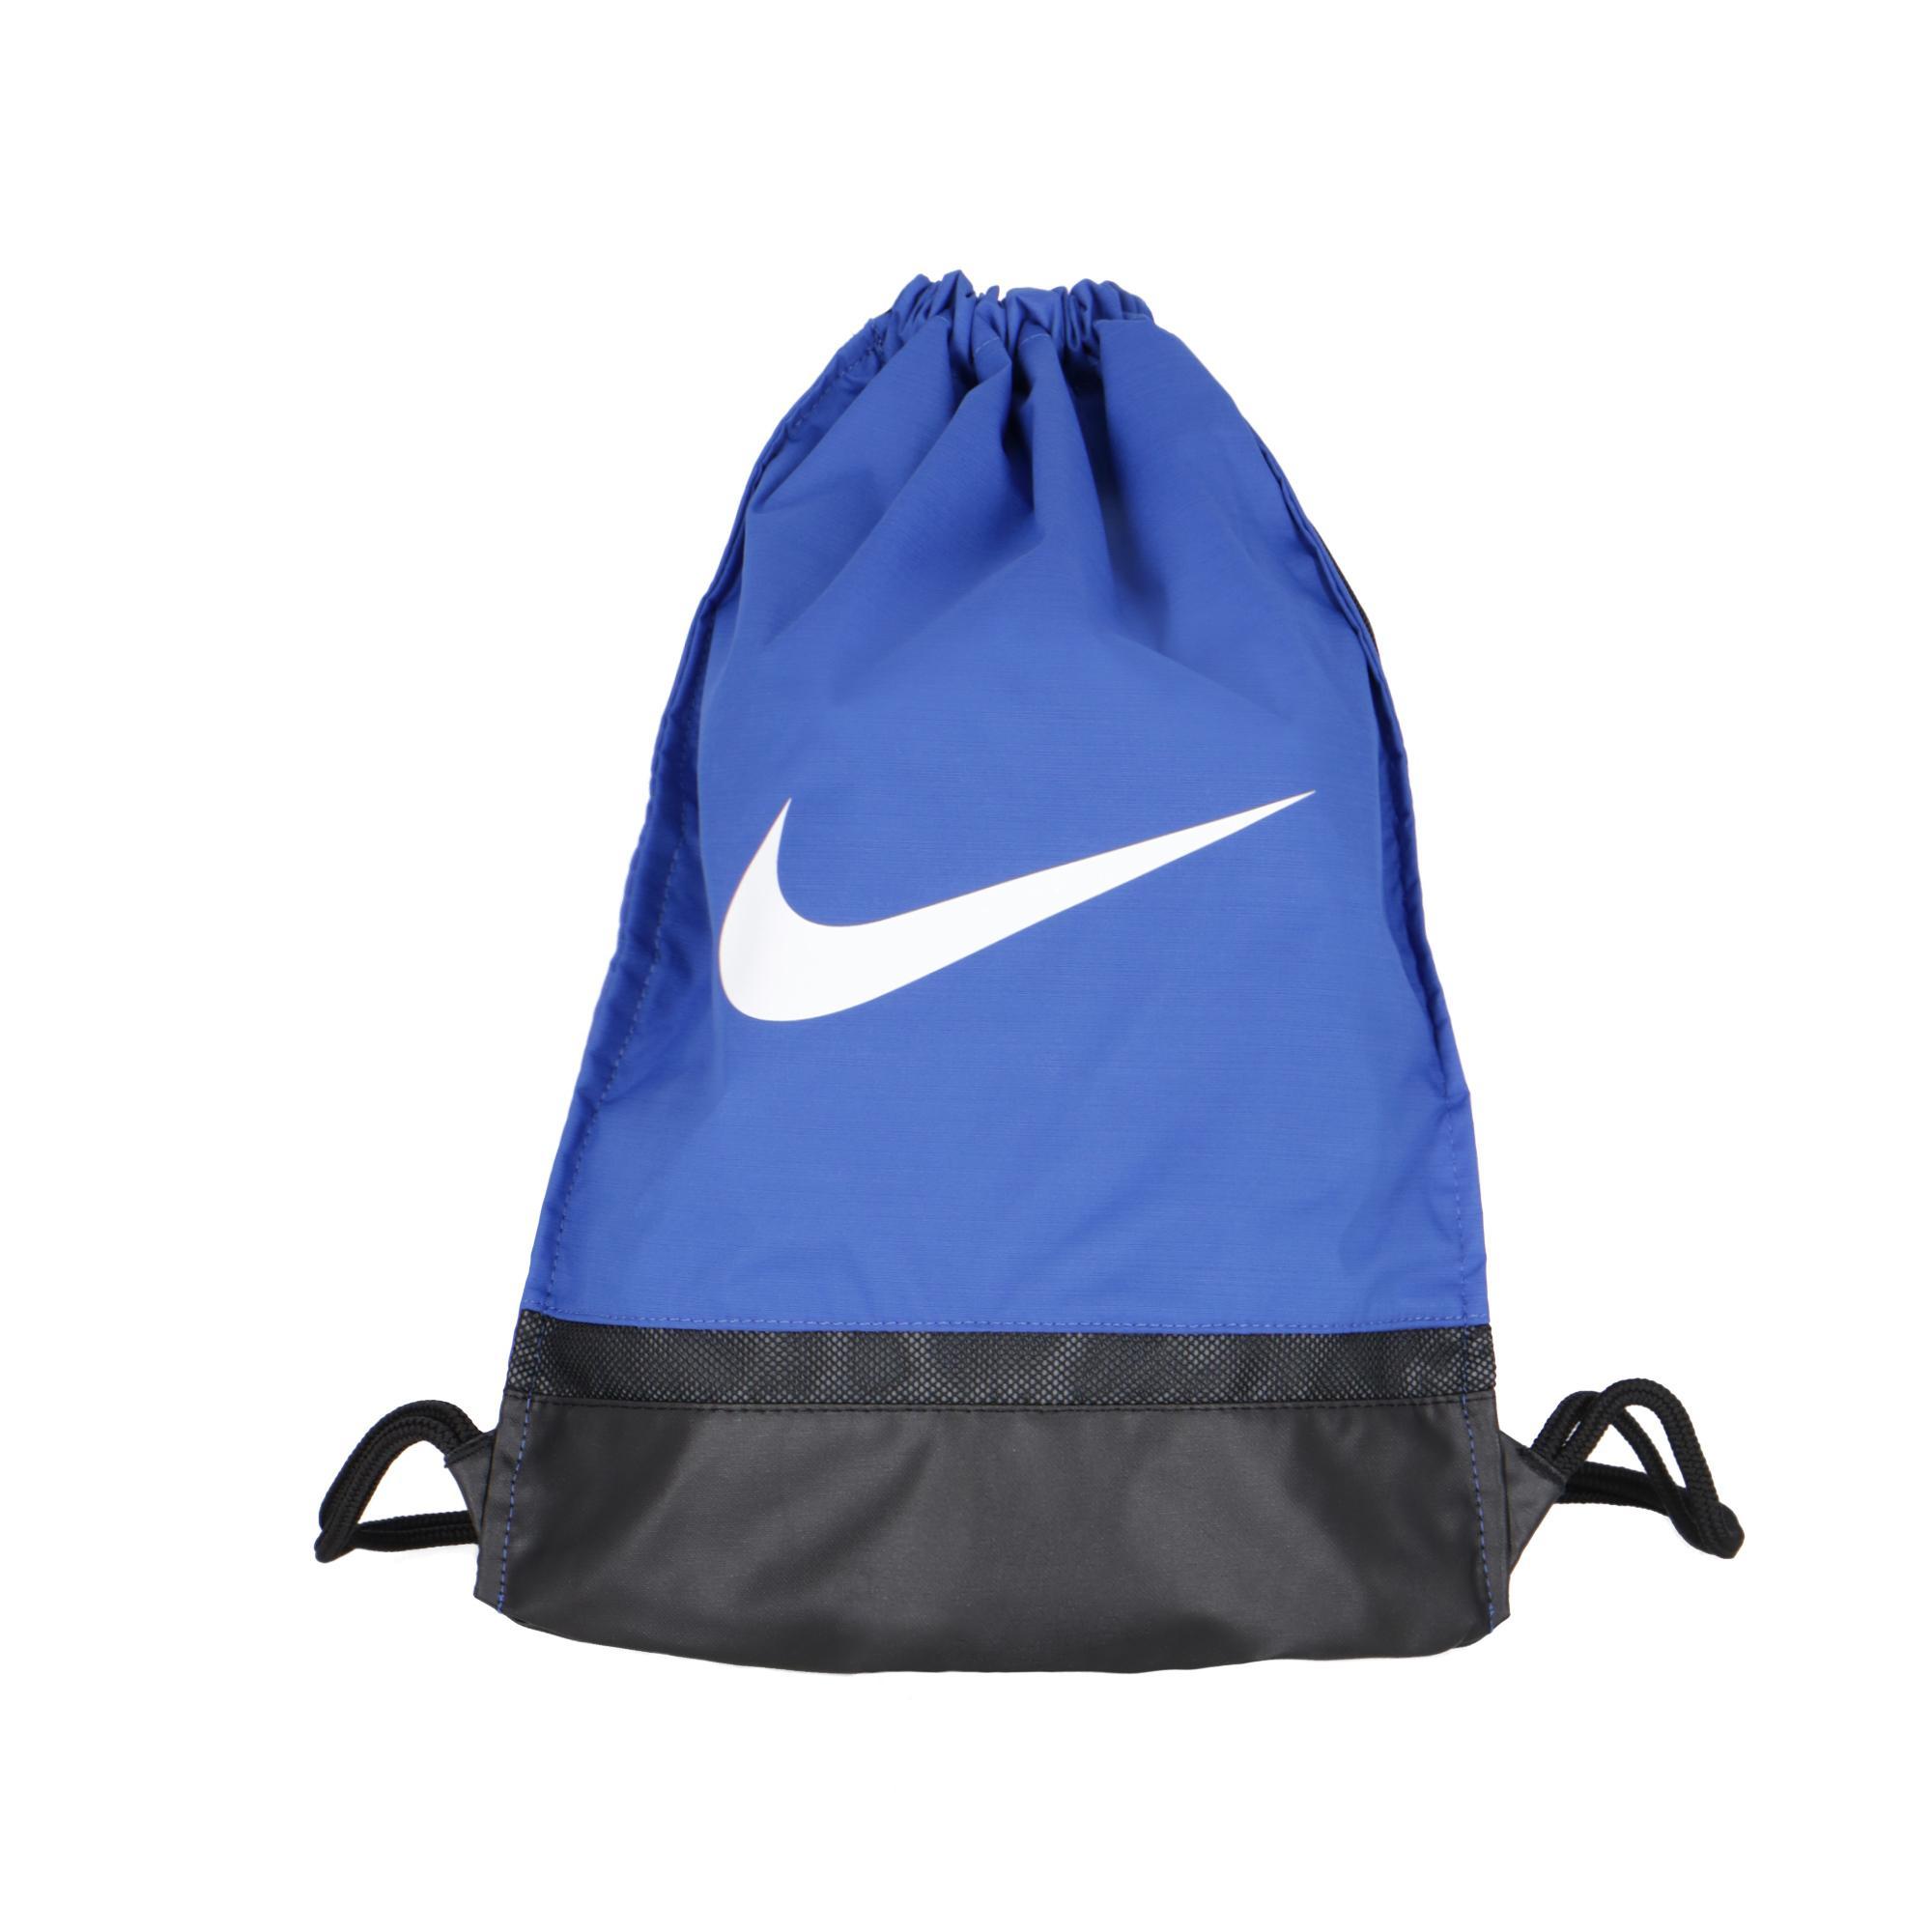 9ecd4e2be5 Nike Brasilia Gym Sack Royal Black